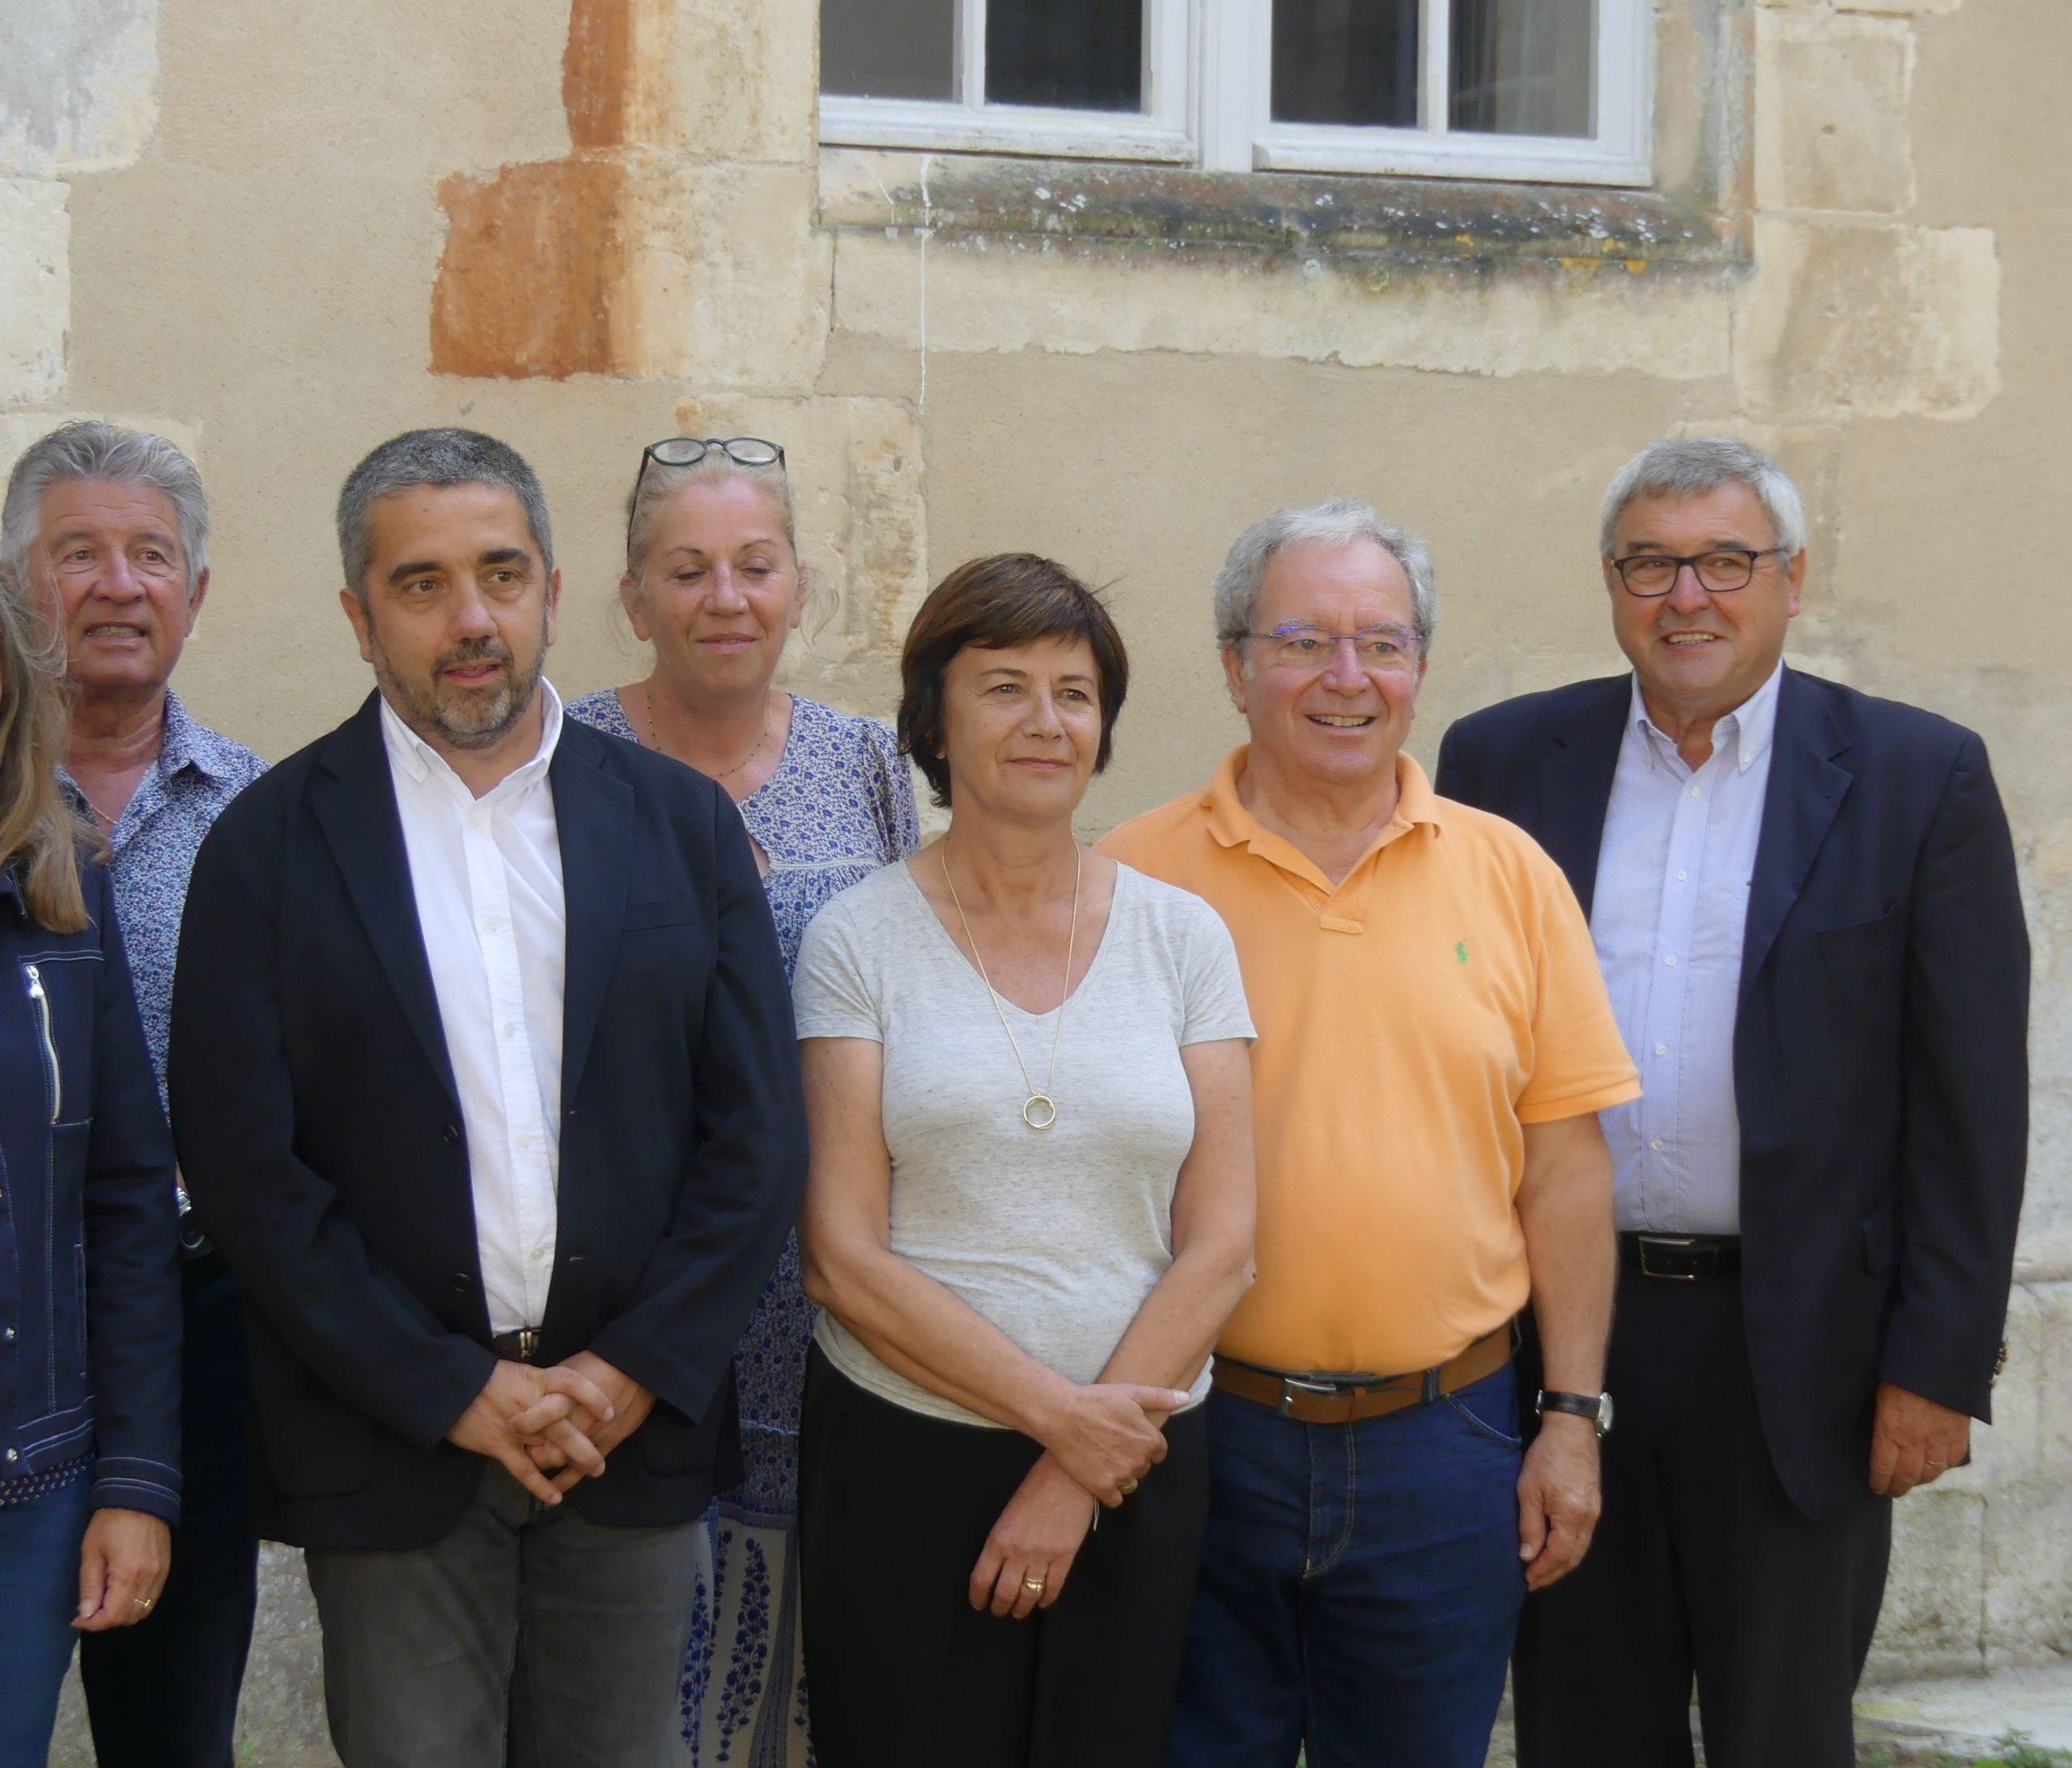 Conseil communautaire 2020-2026 - 9 juillet 2020